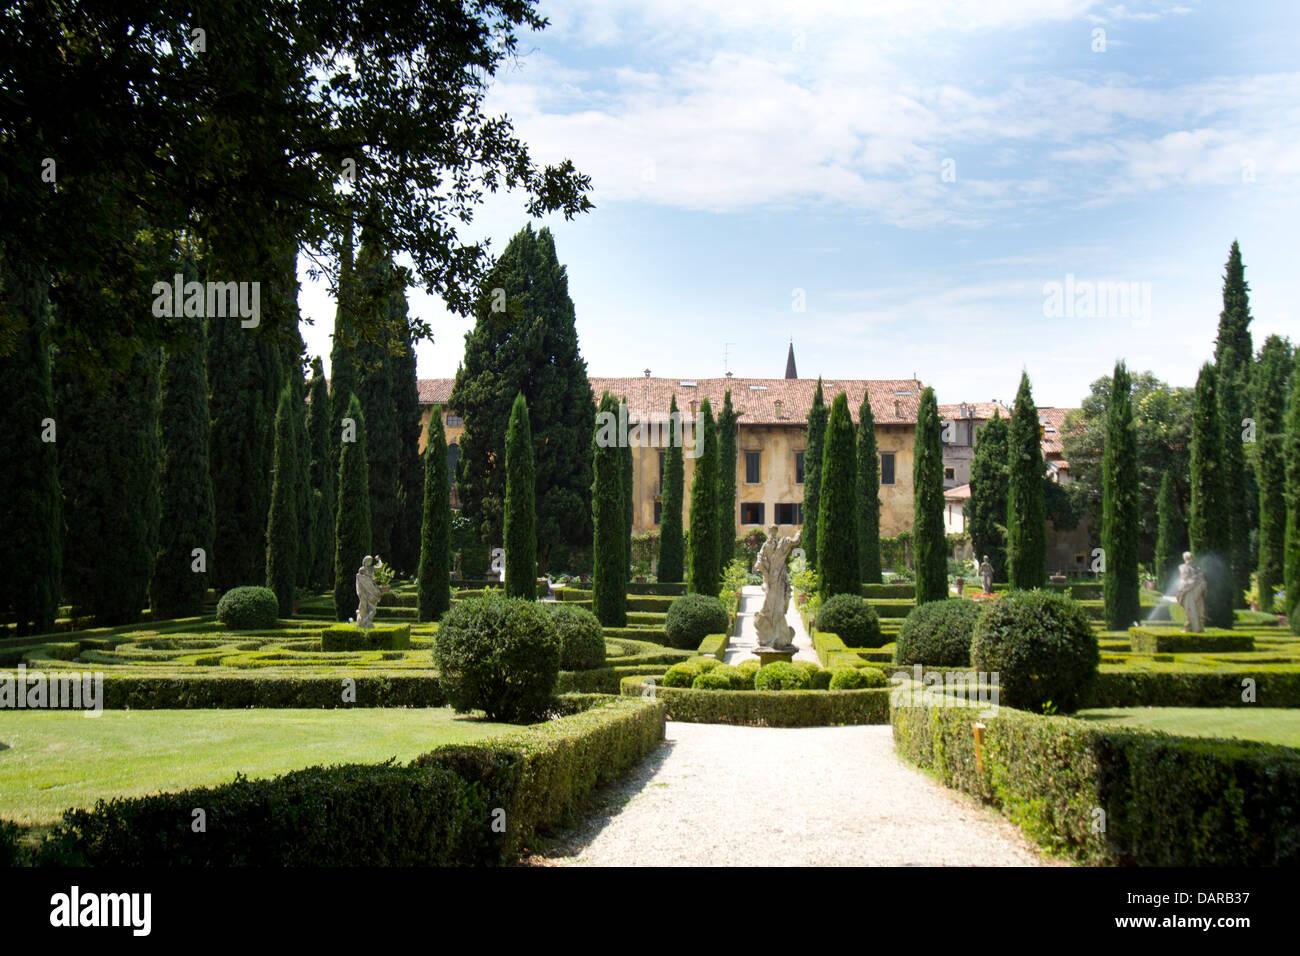 Giusti palast und garten palazzo e giardino giusti verona